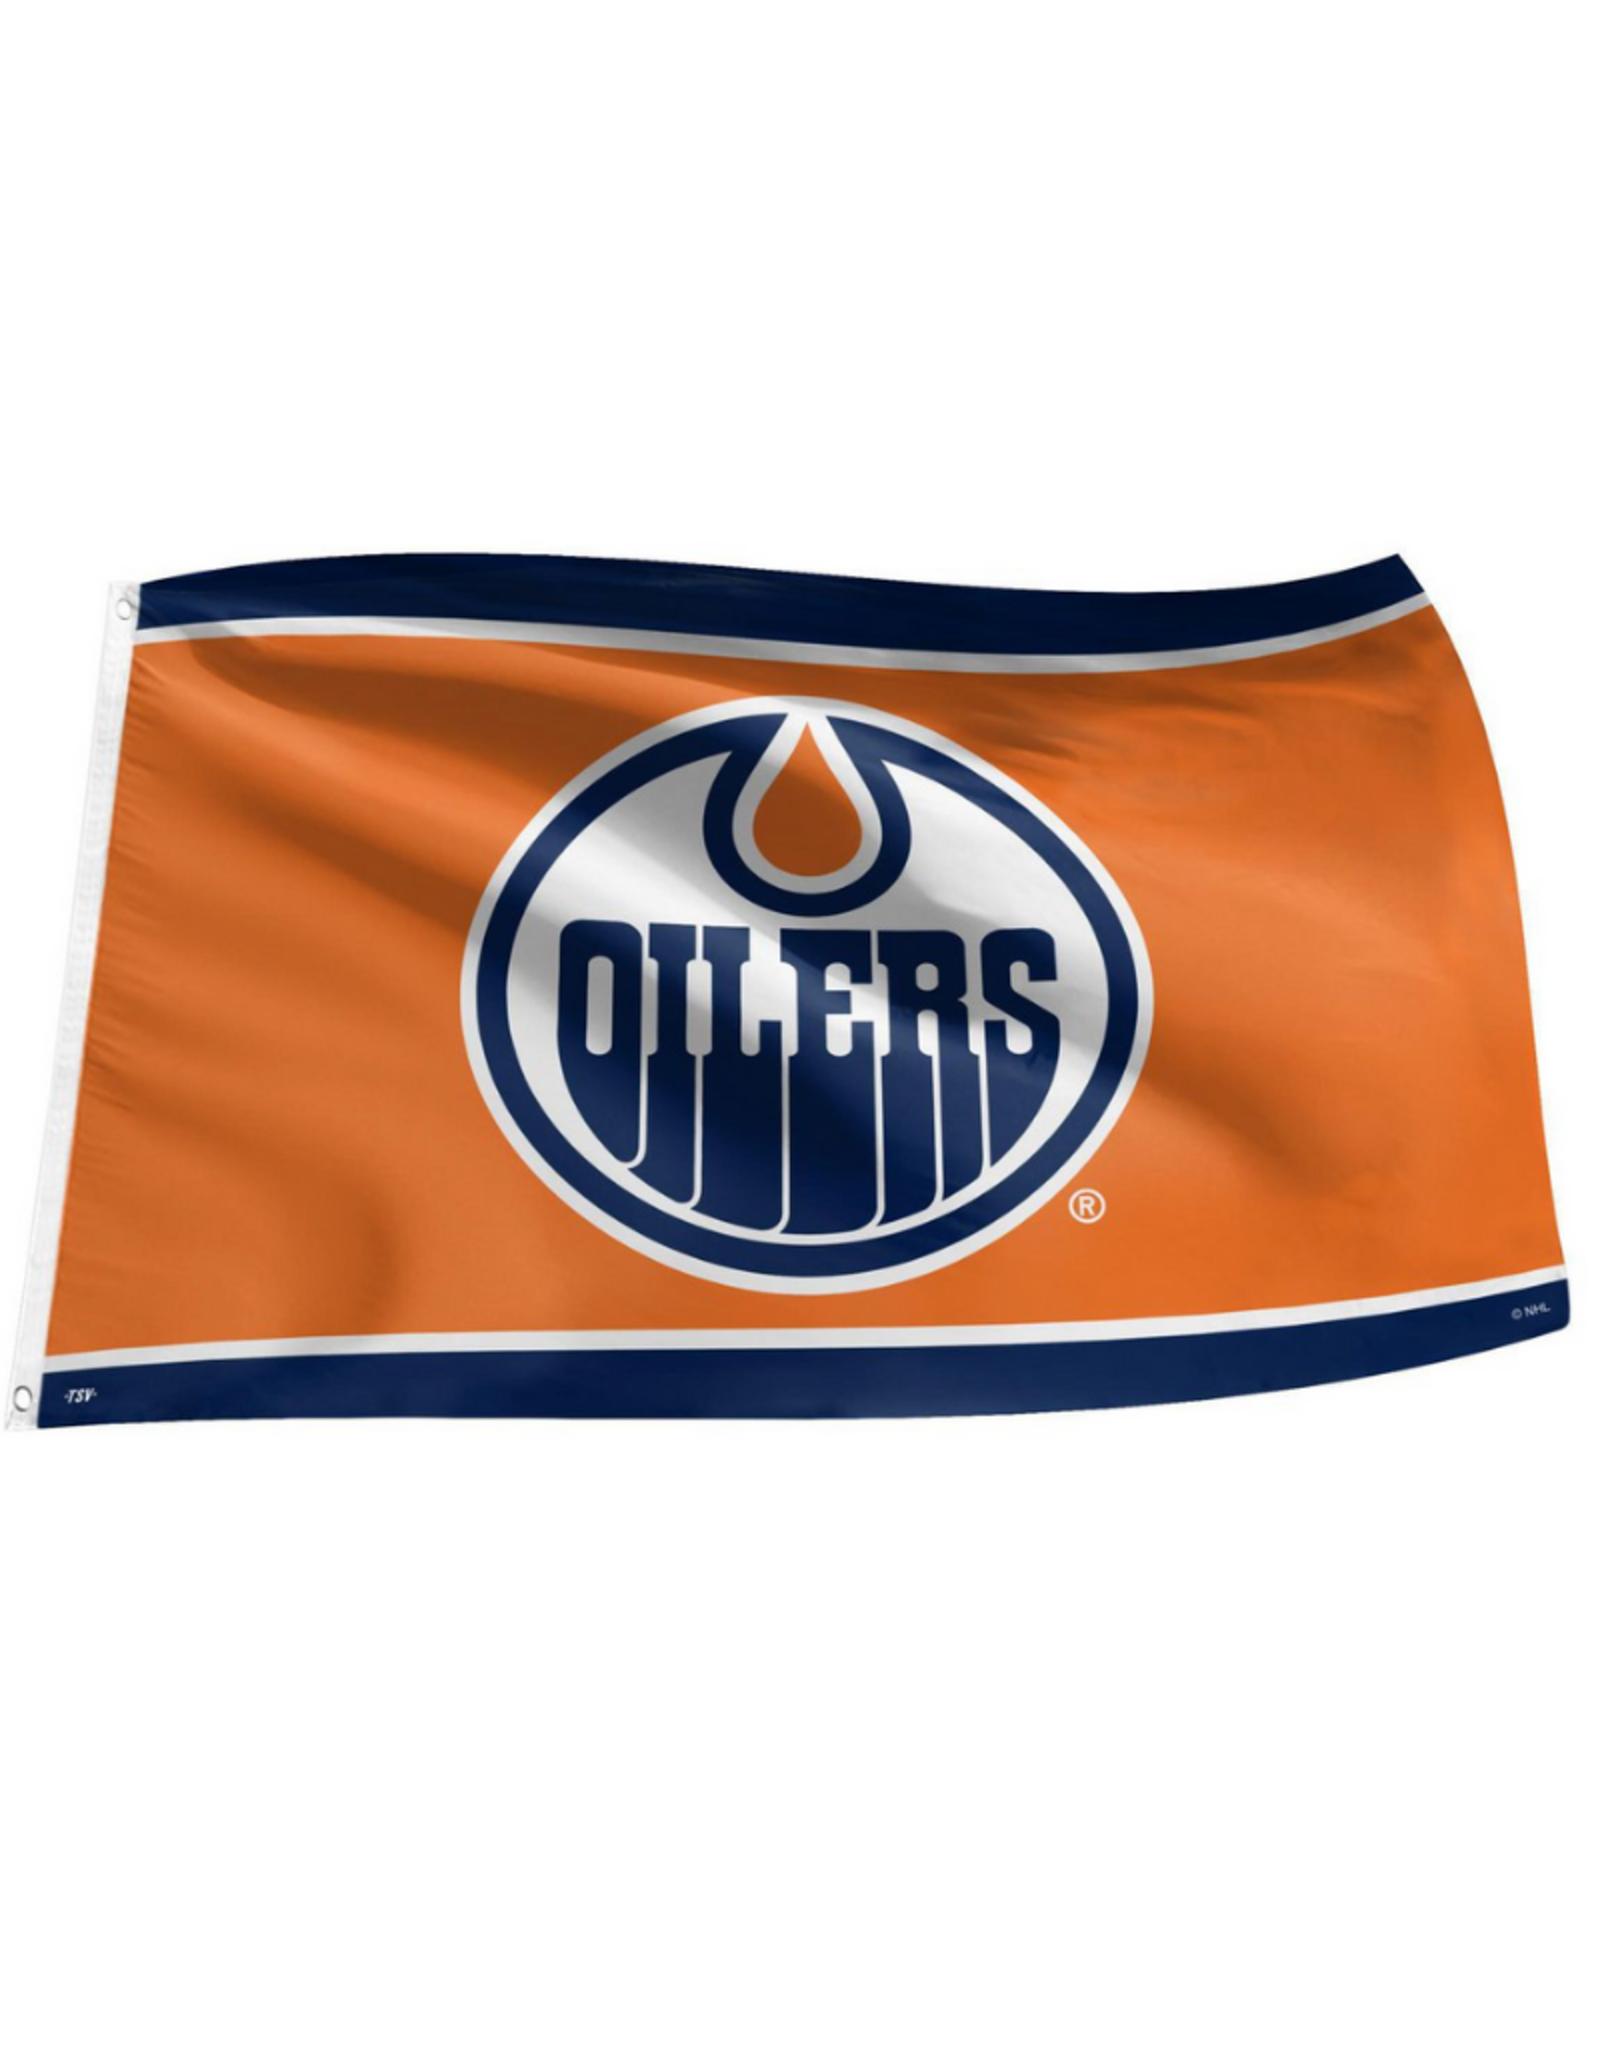 NHL 3' x 5' Team Logo Flag Edmonton Oilers Orange